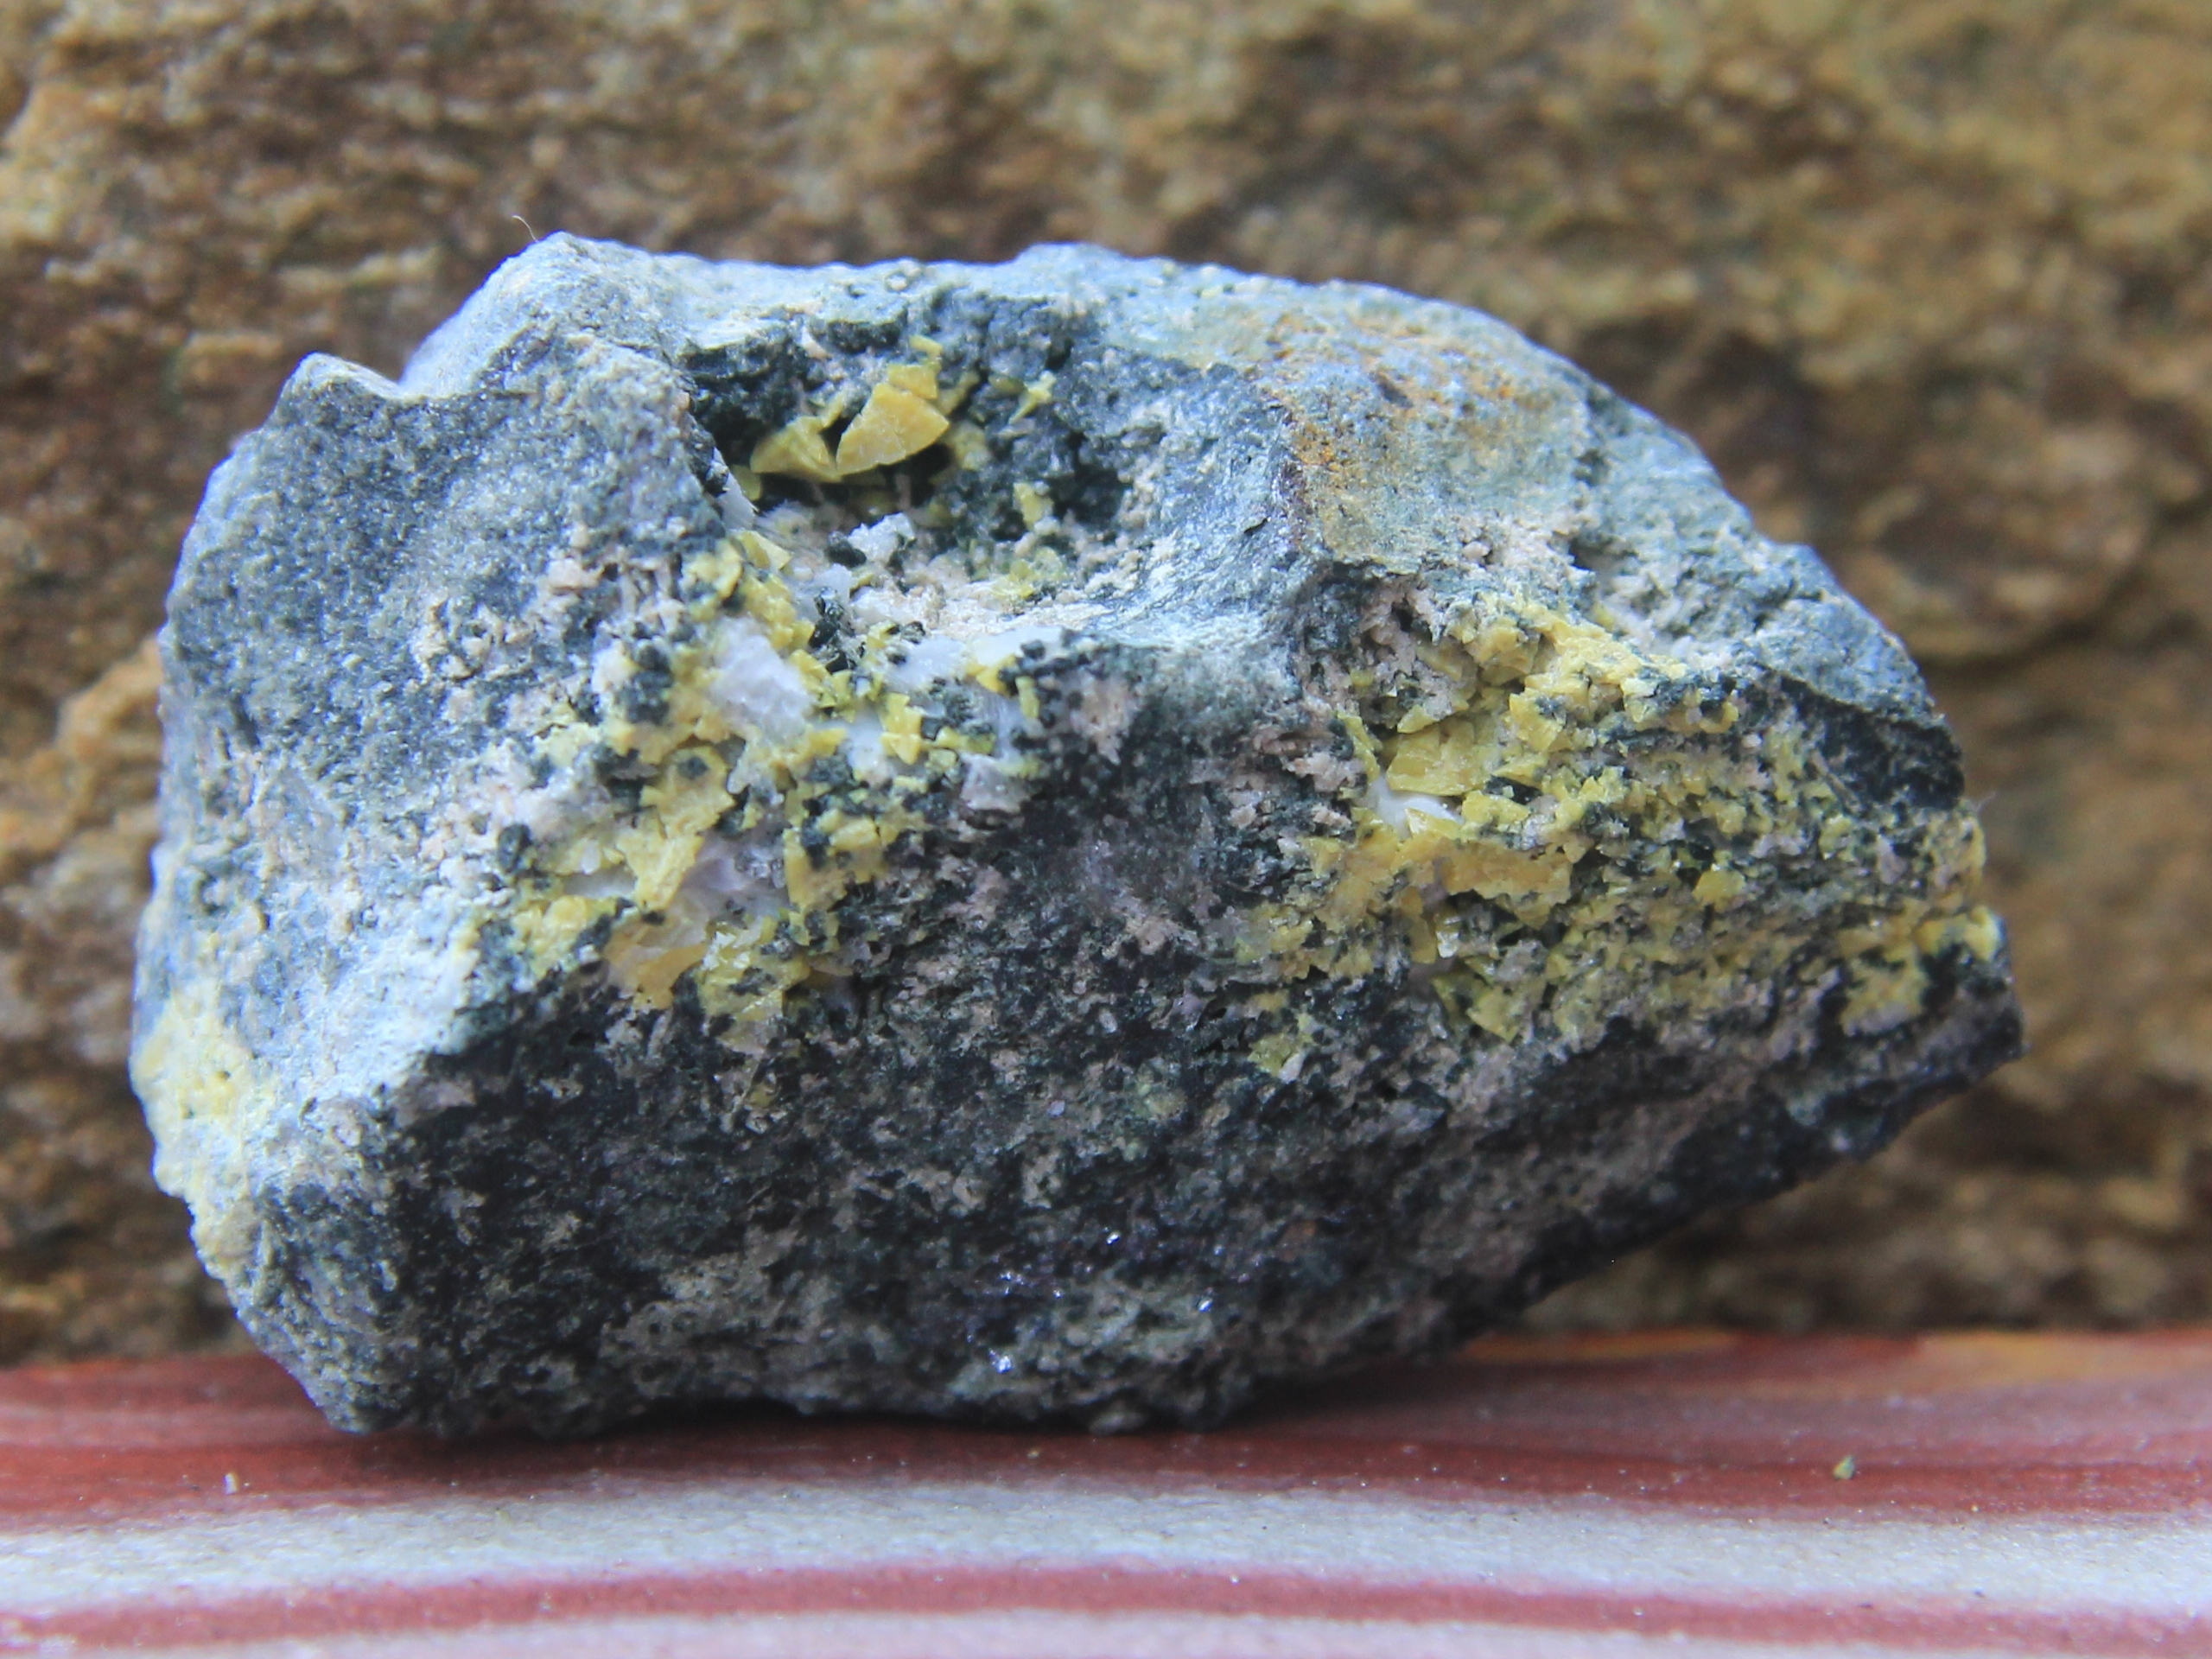 Helvine crystals